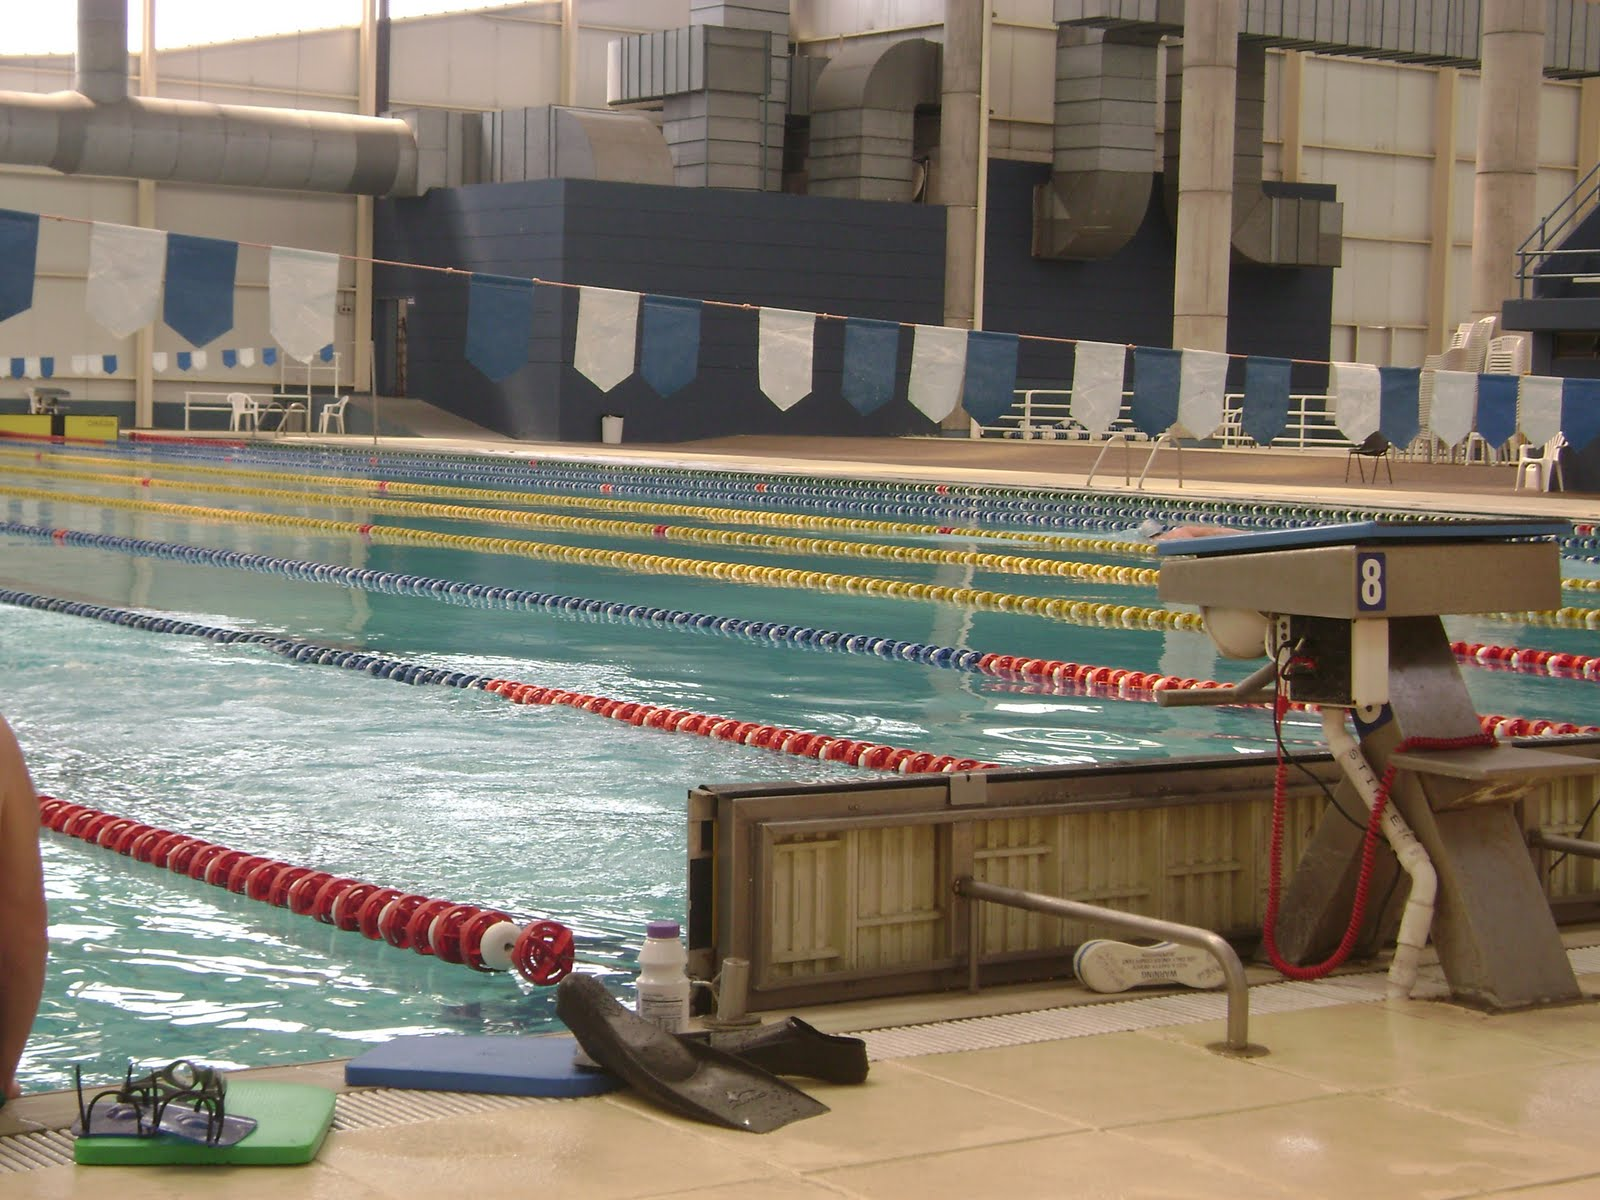 Choele nataci n master novedades del argentino master for Novedades del espectaculo argentino